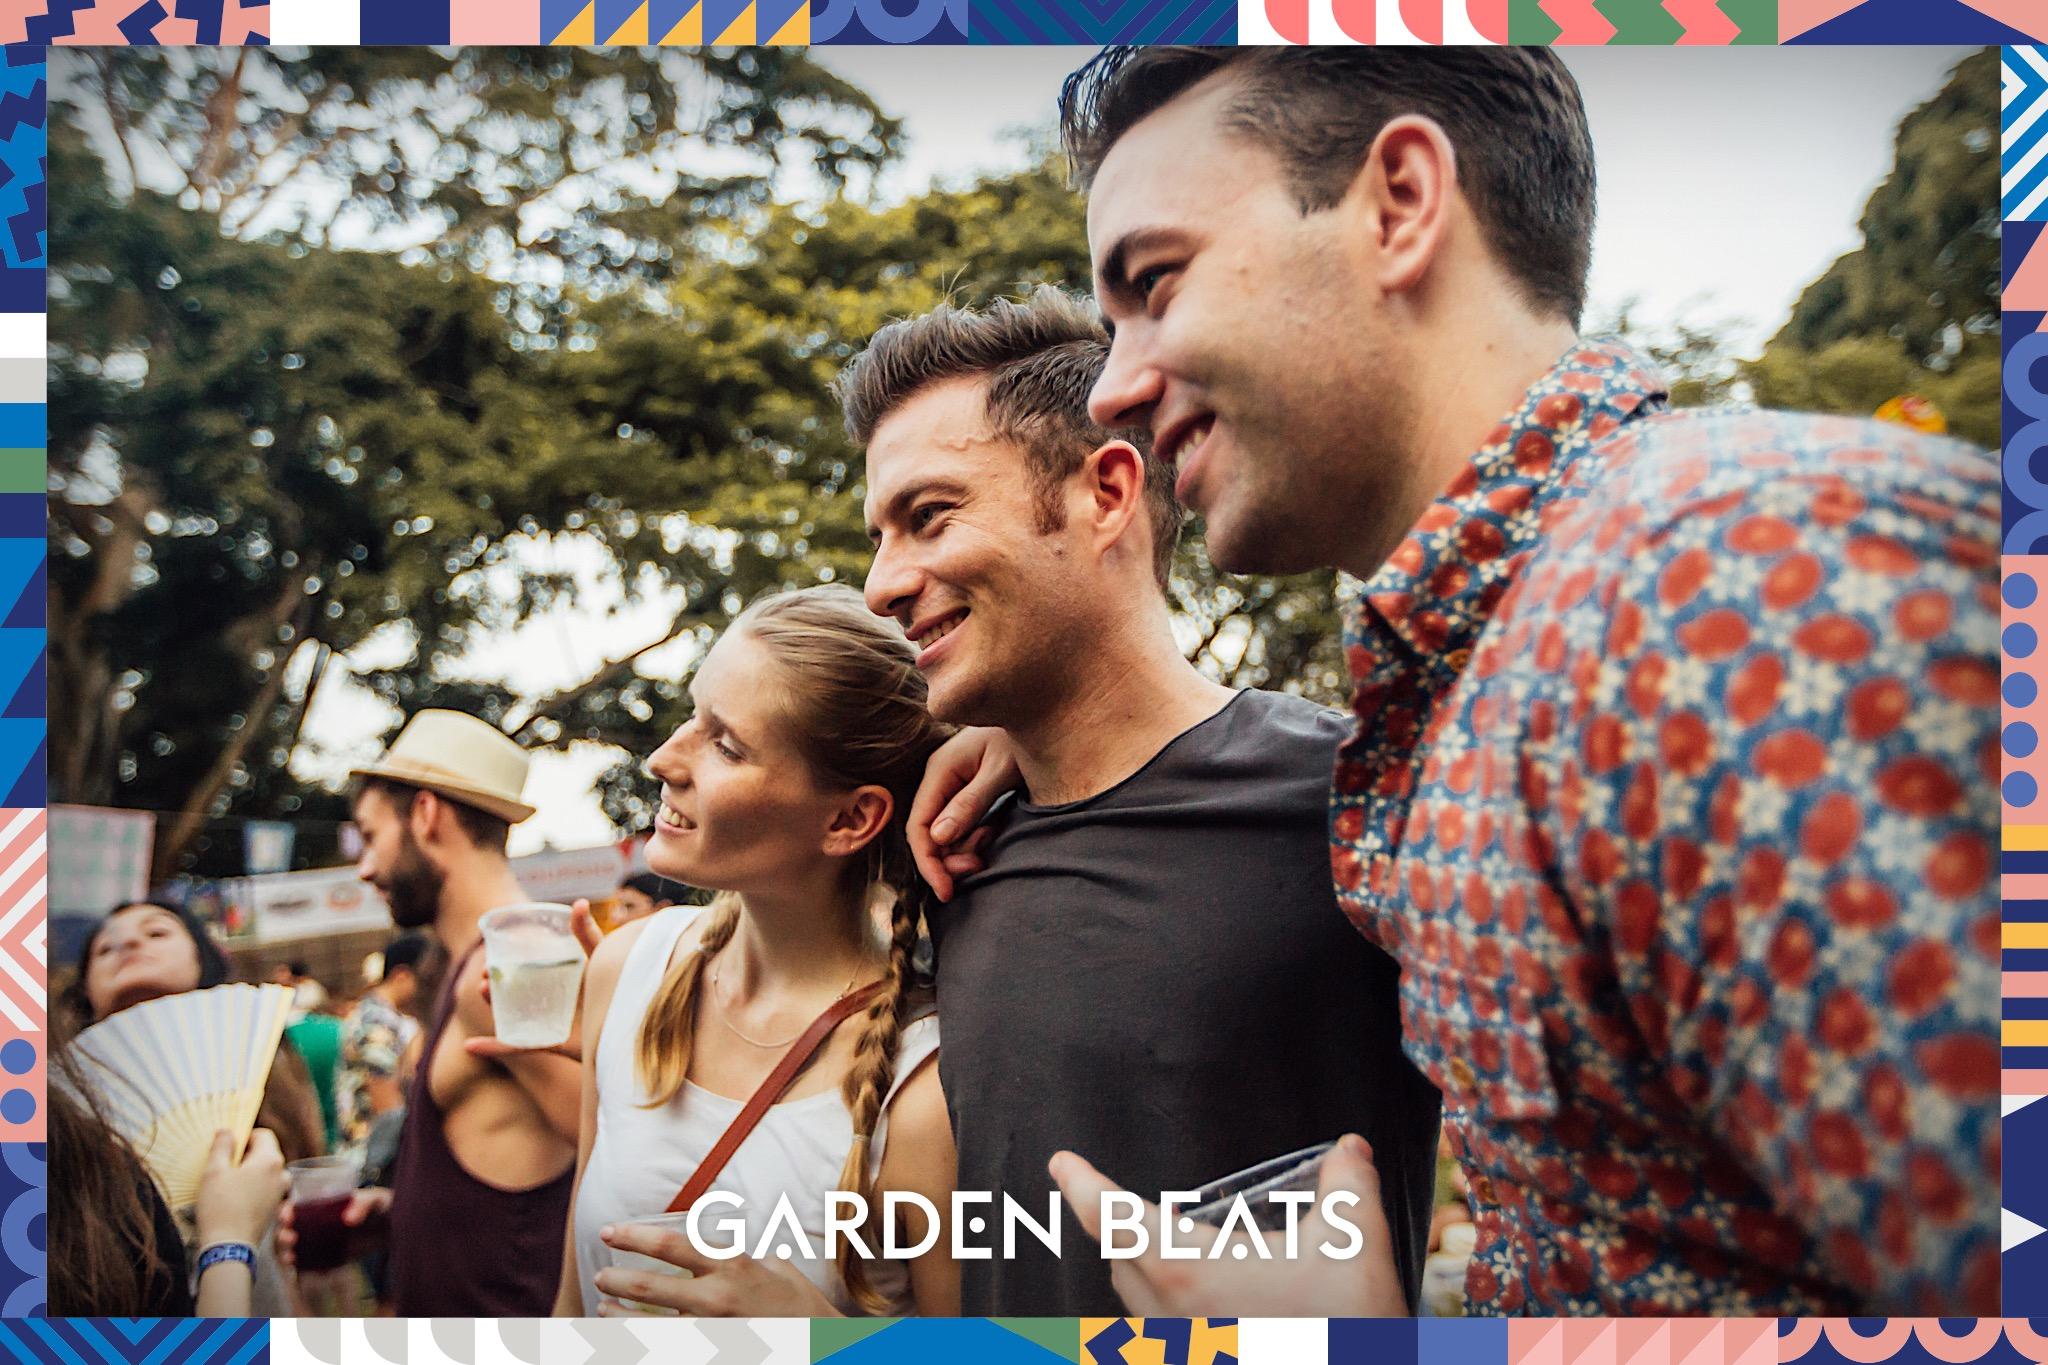 18032017_GardenBeats_Colossal670_WatermarkedGB.jpg